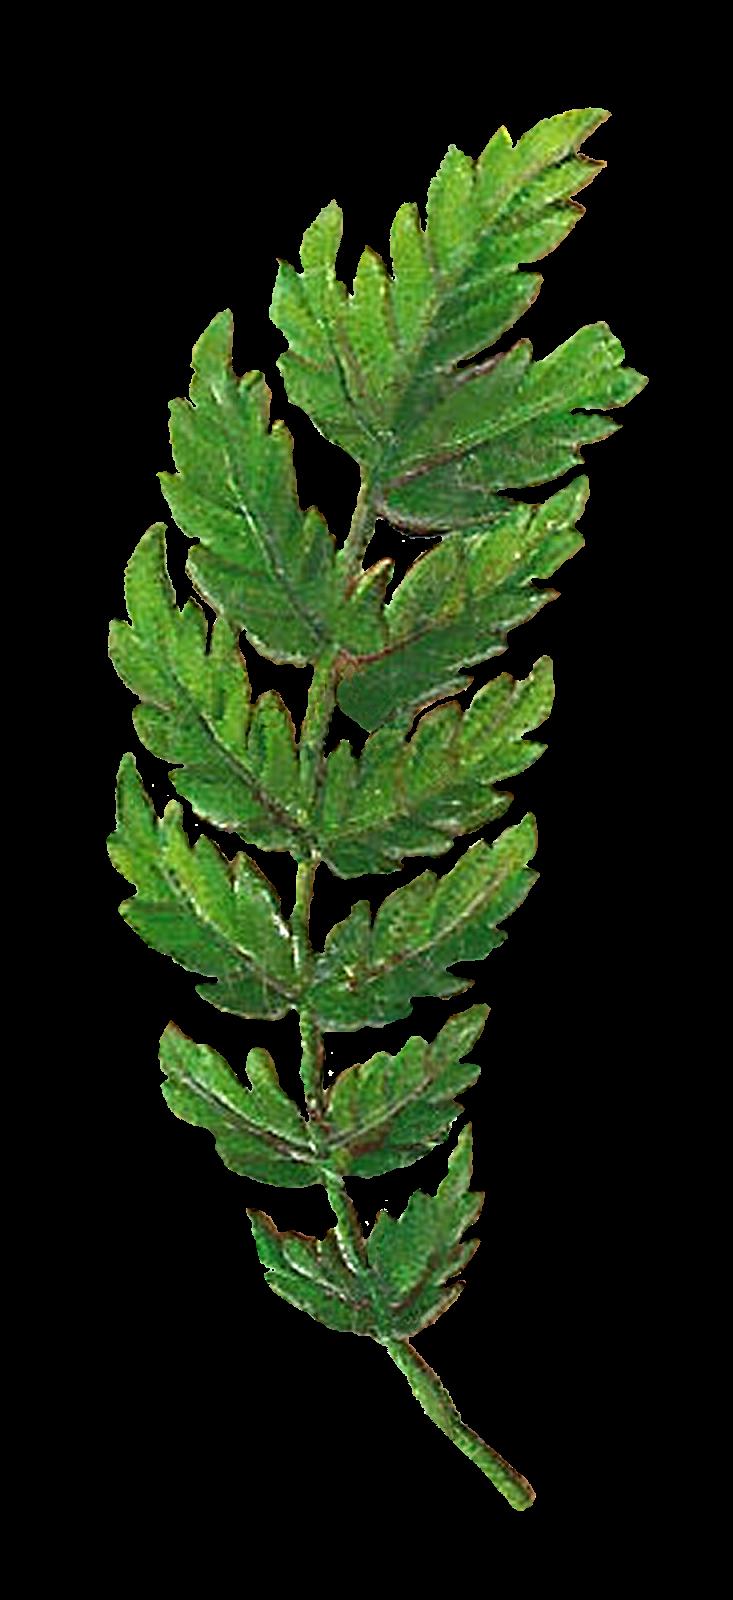 Hammer clipart pillow. Leaf botanical artwork digital